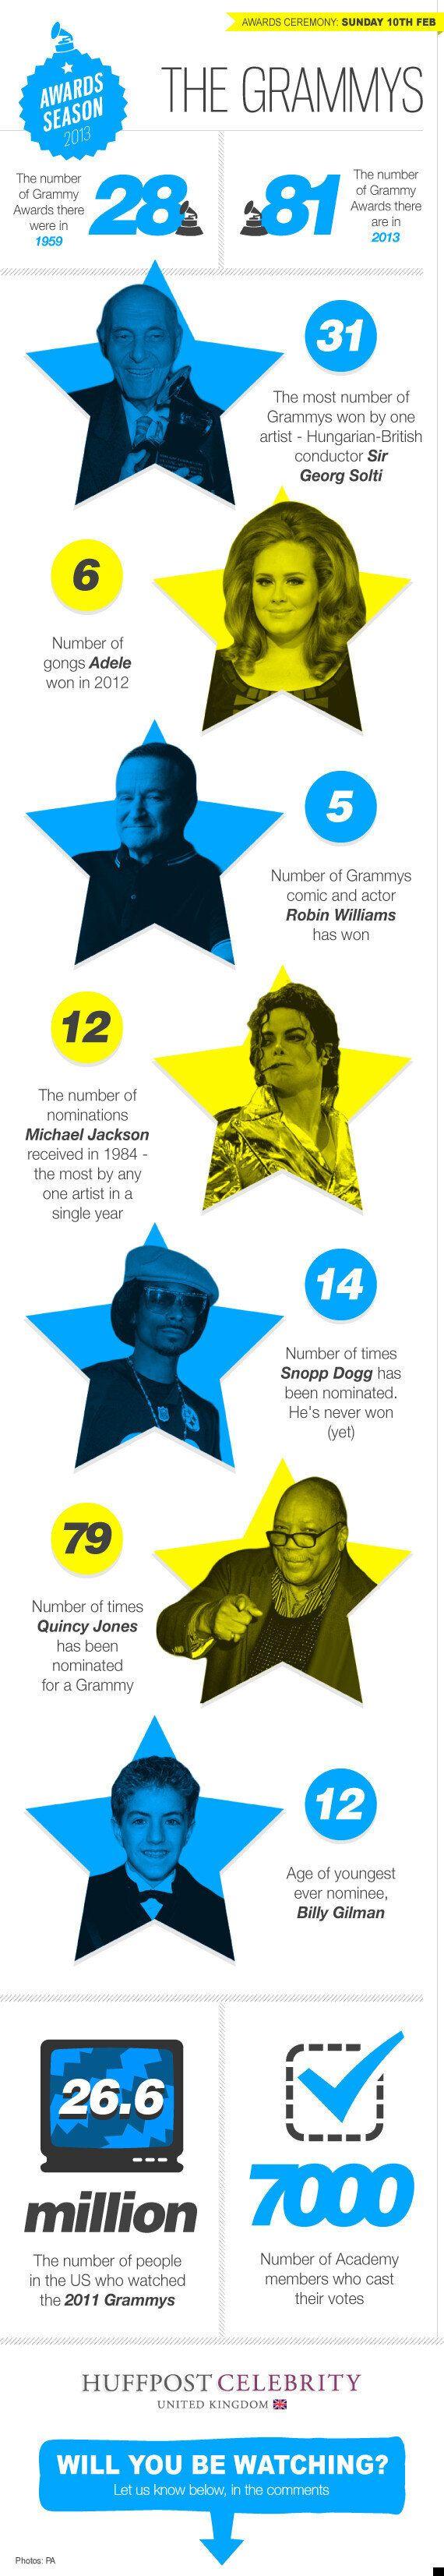 Grammys 2014: The 56th Grammy Awards In